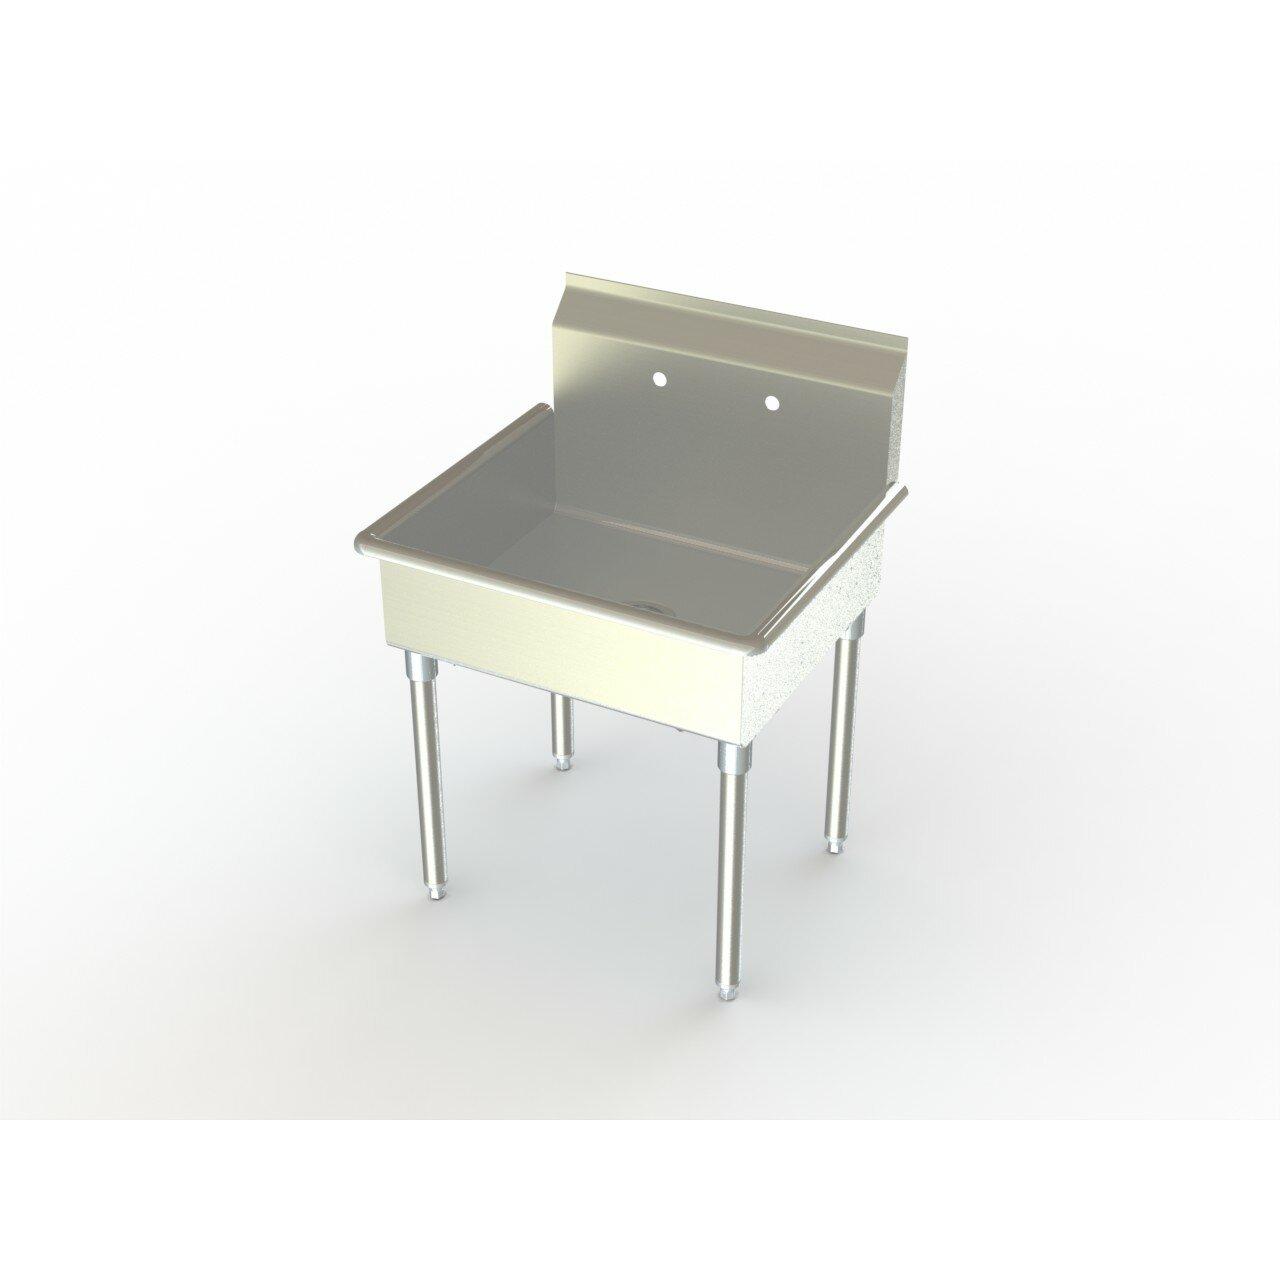 24x24 Mop Sink : ... Manufacturing 24